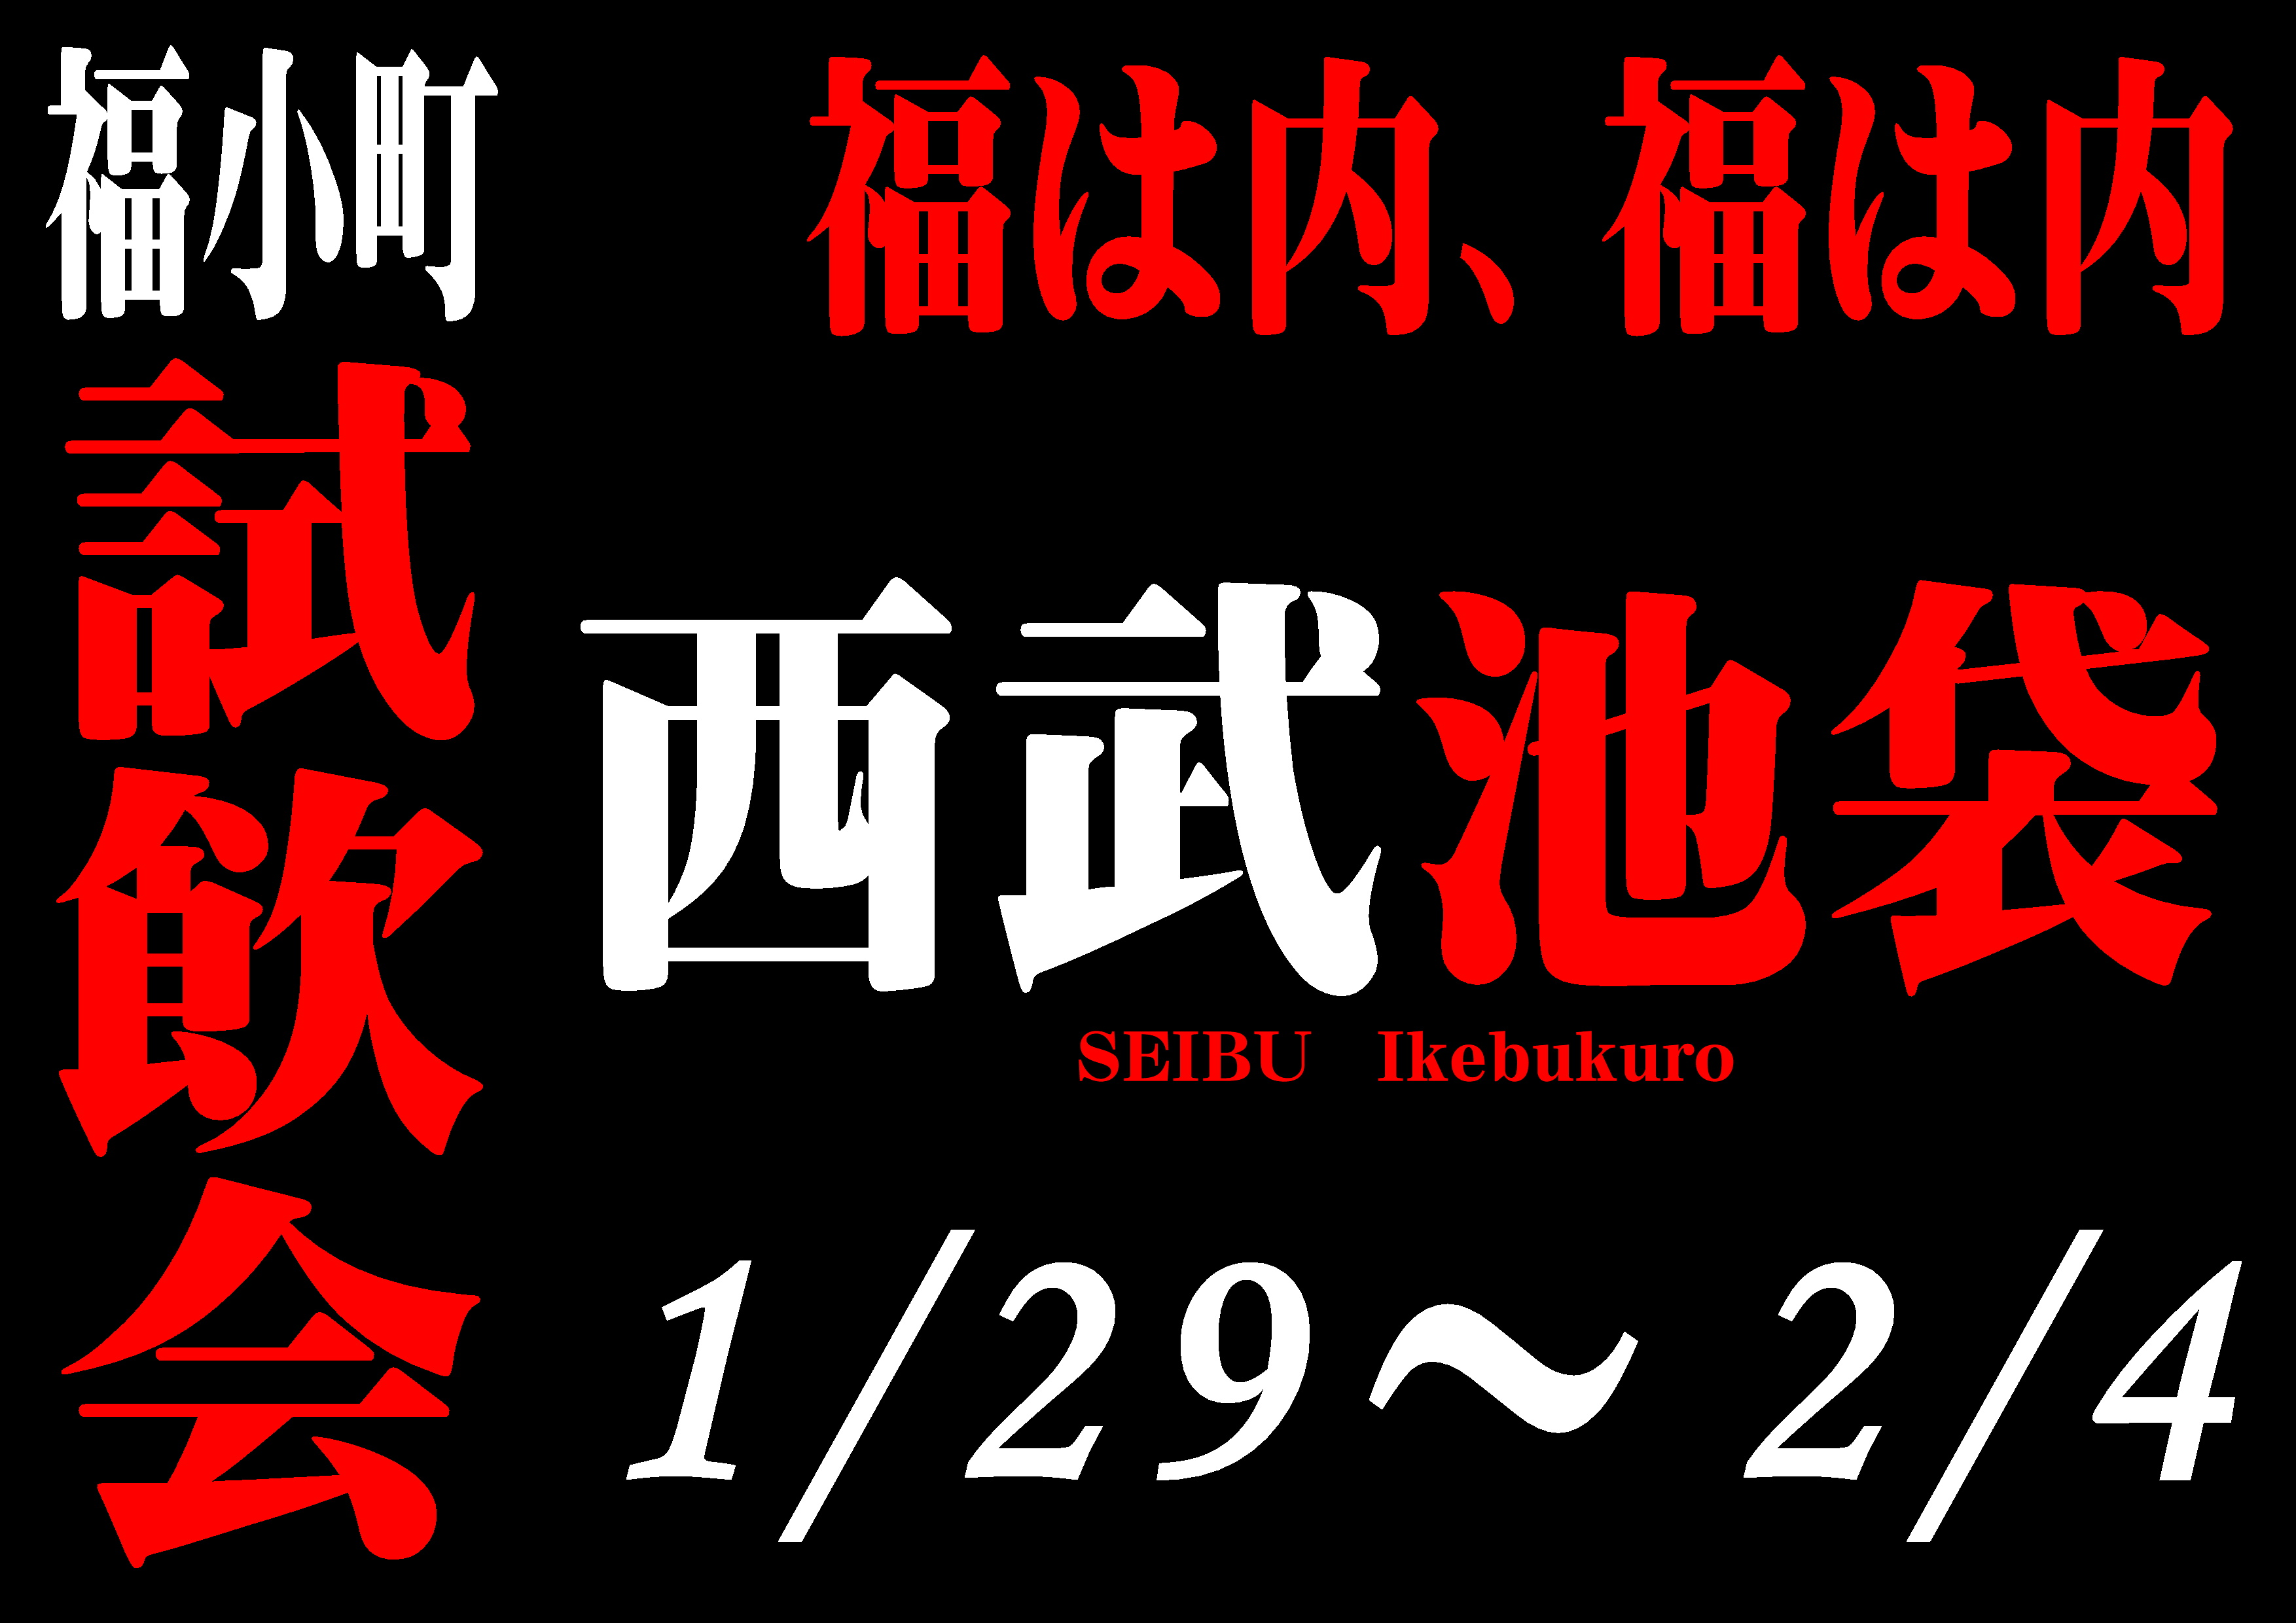 http://www.fukukomachi.com/blog/photo/20200129.JPG